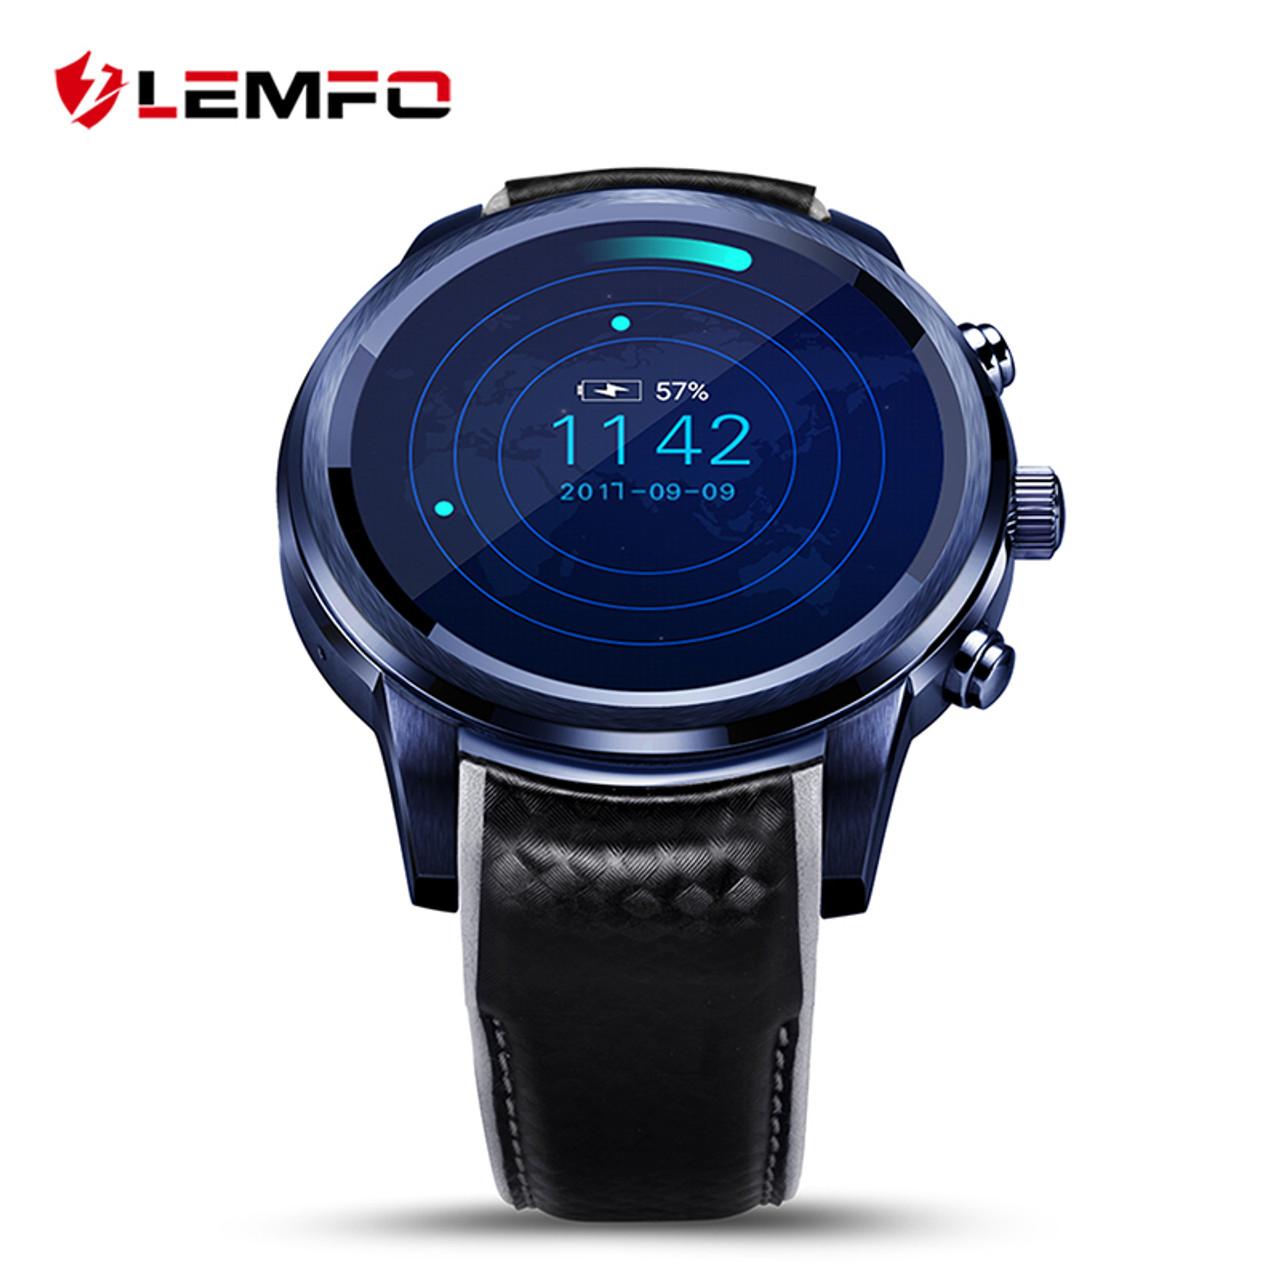 5fc47f6ff78 LEMFO LEM5 Pro Smart Watch Phone Android 5.1 2GB + 16GB Support SIM card  GPS WiFi ...